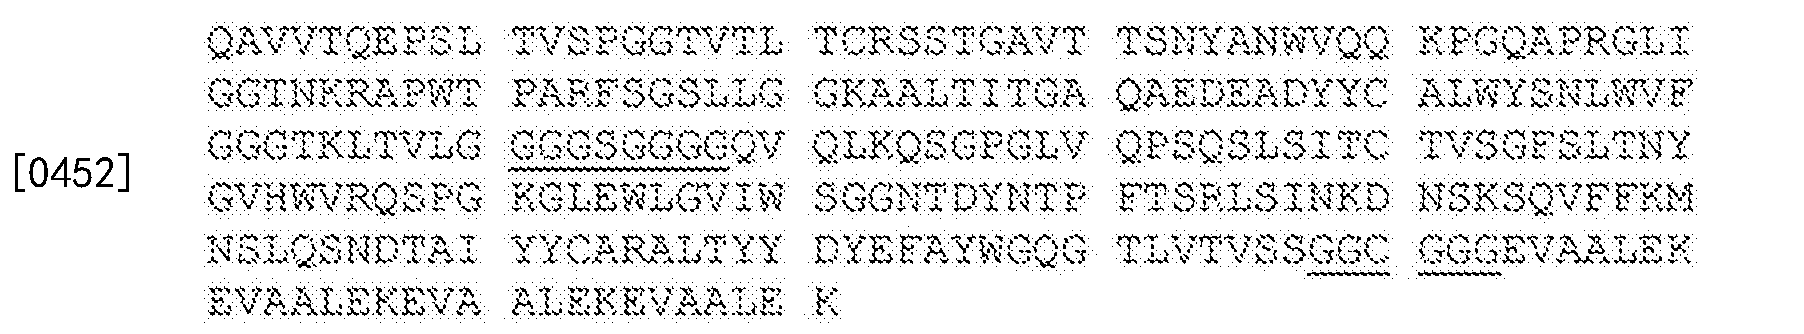 Figure CN107827985AD00602